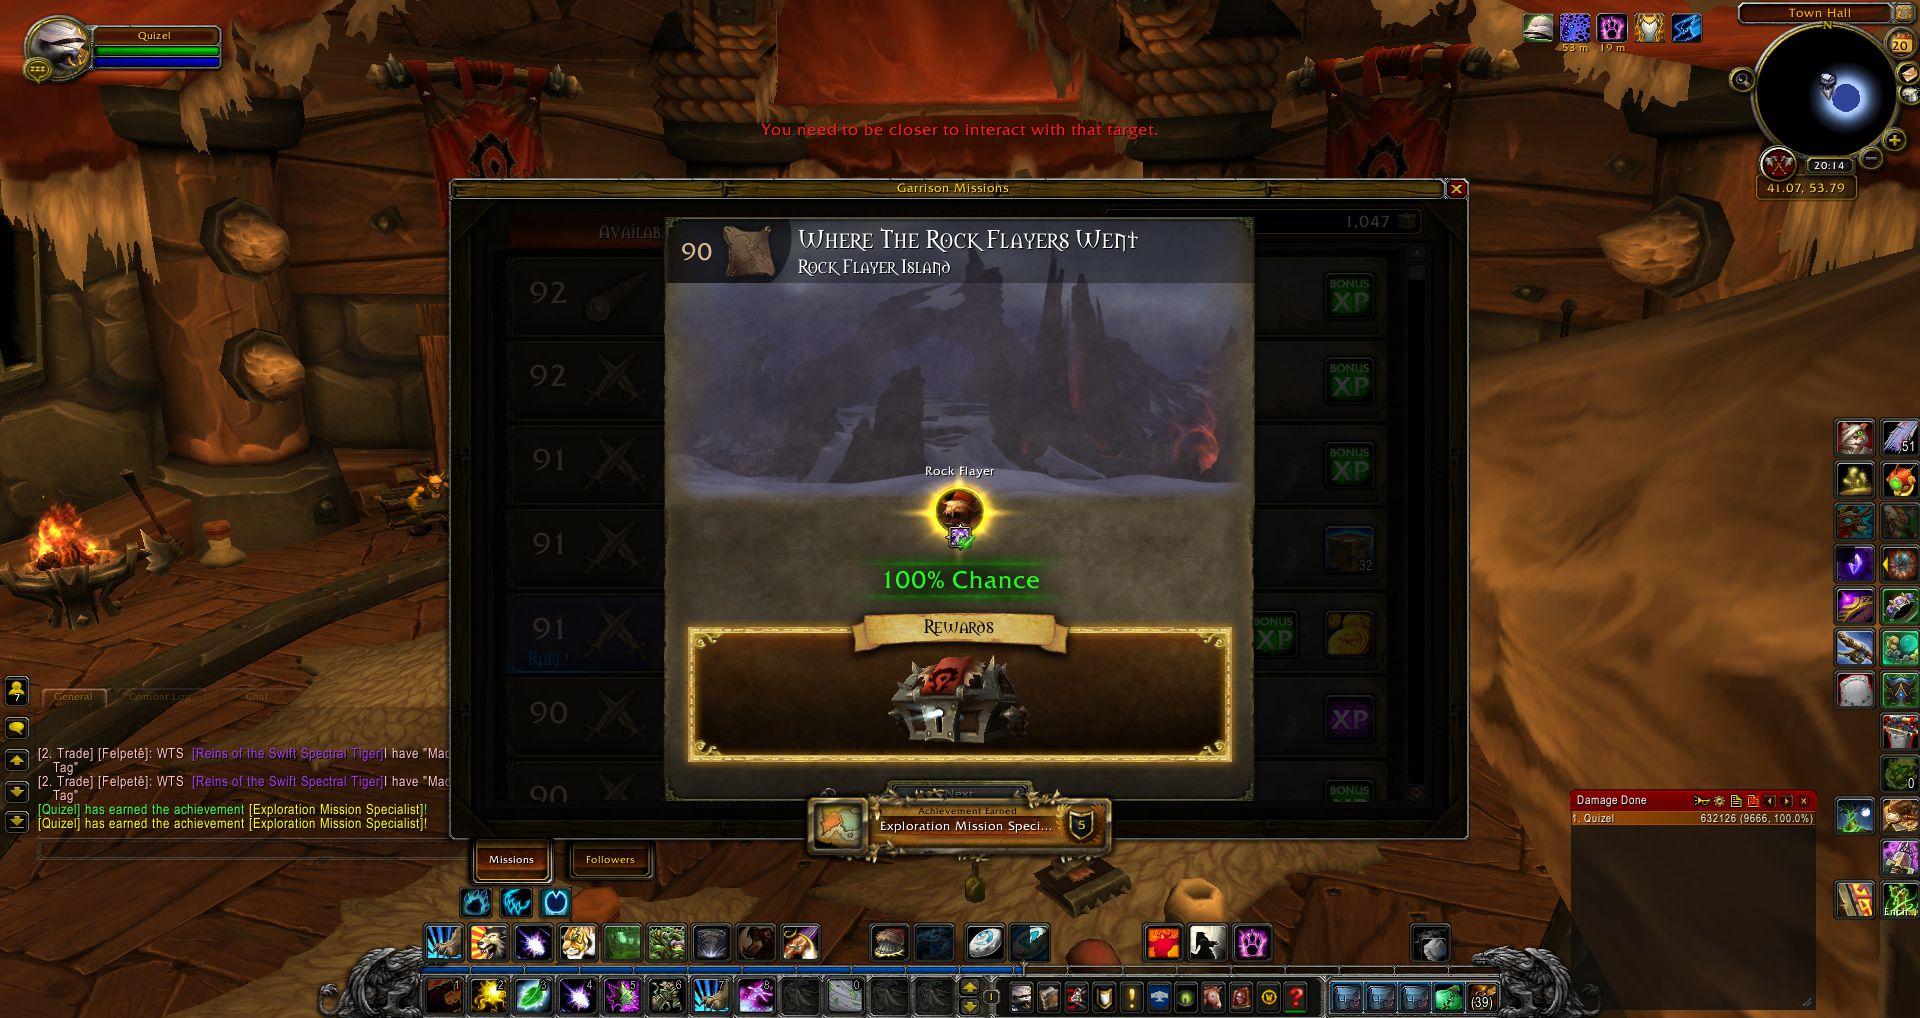 Where the Rock Flayers Went wow screenshot - Gamingcfg com